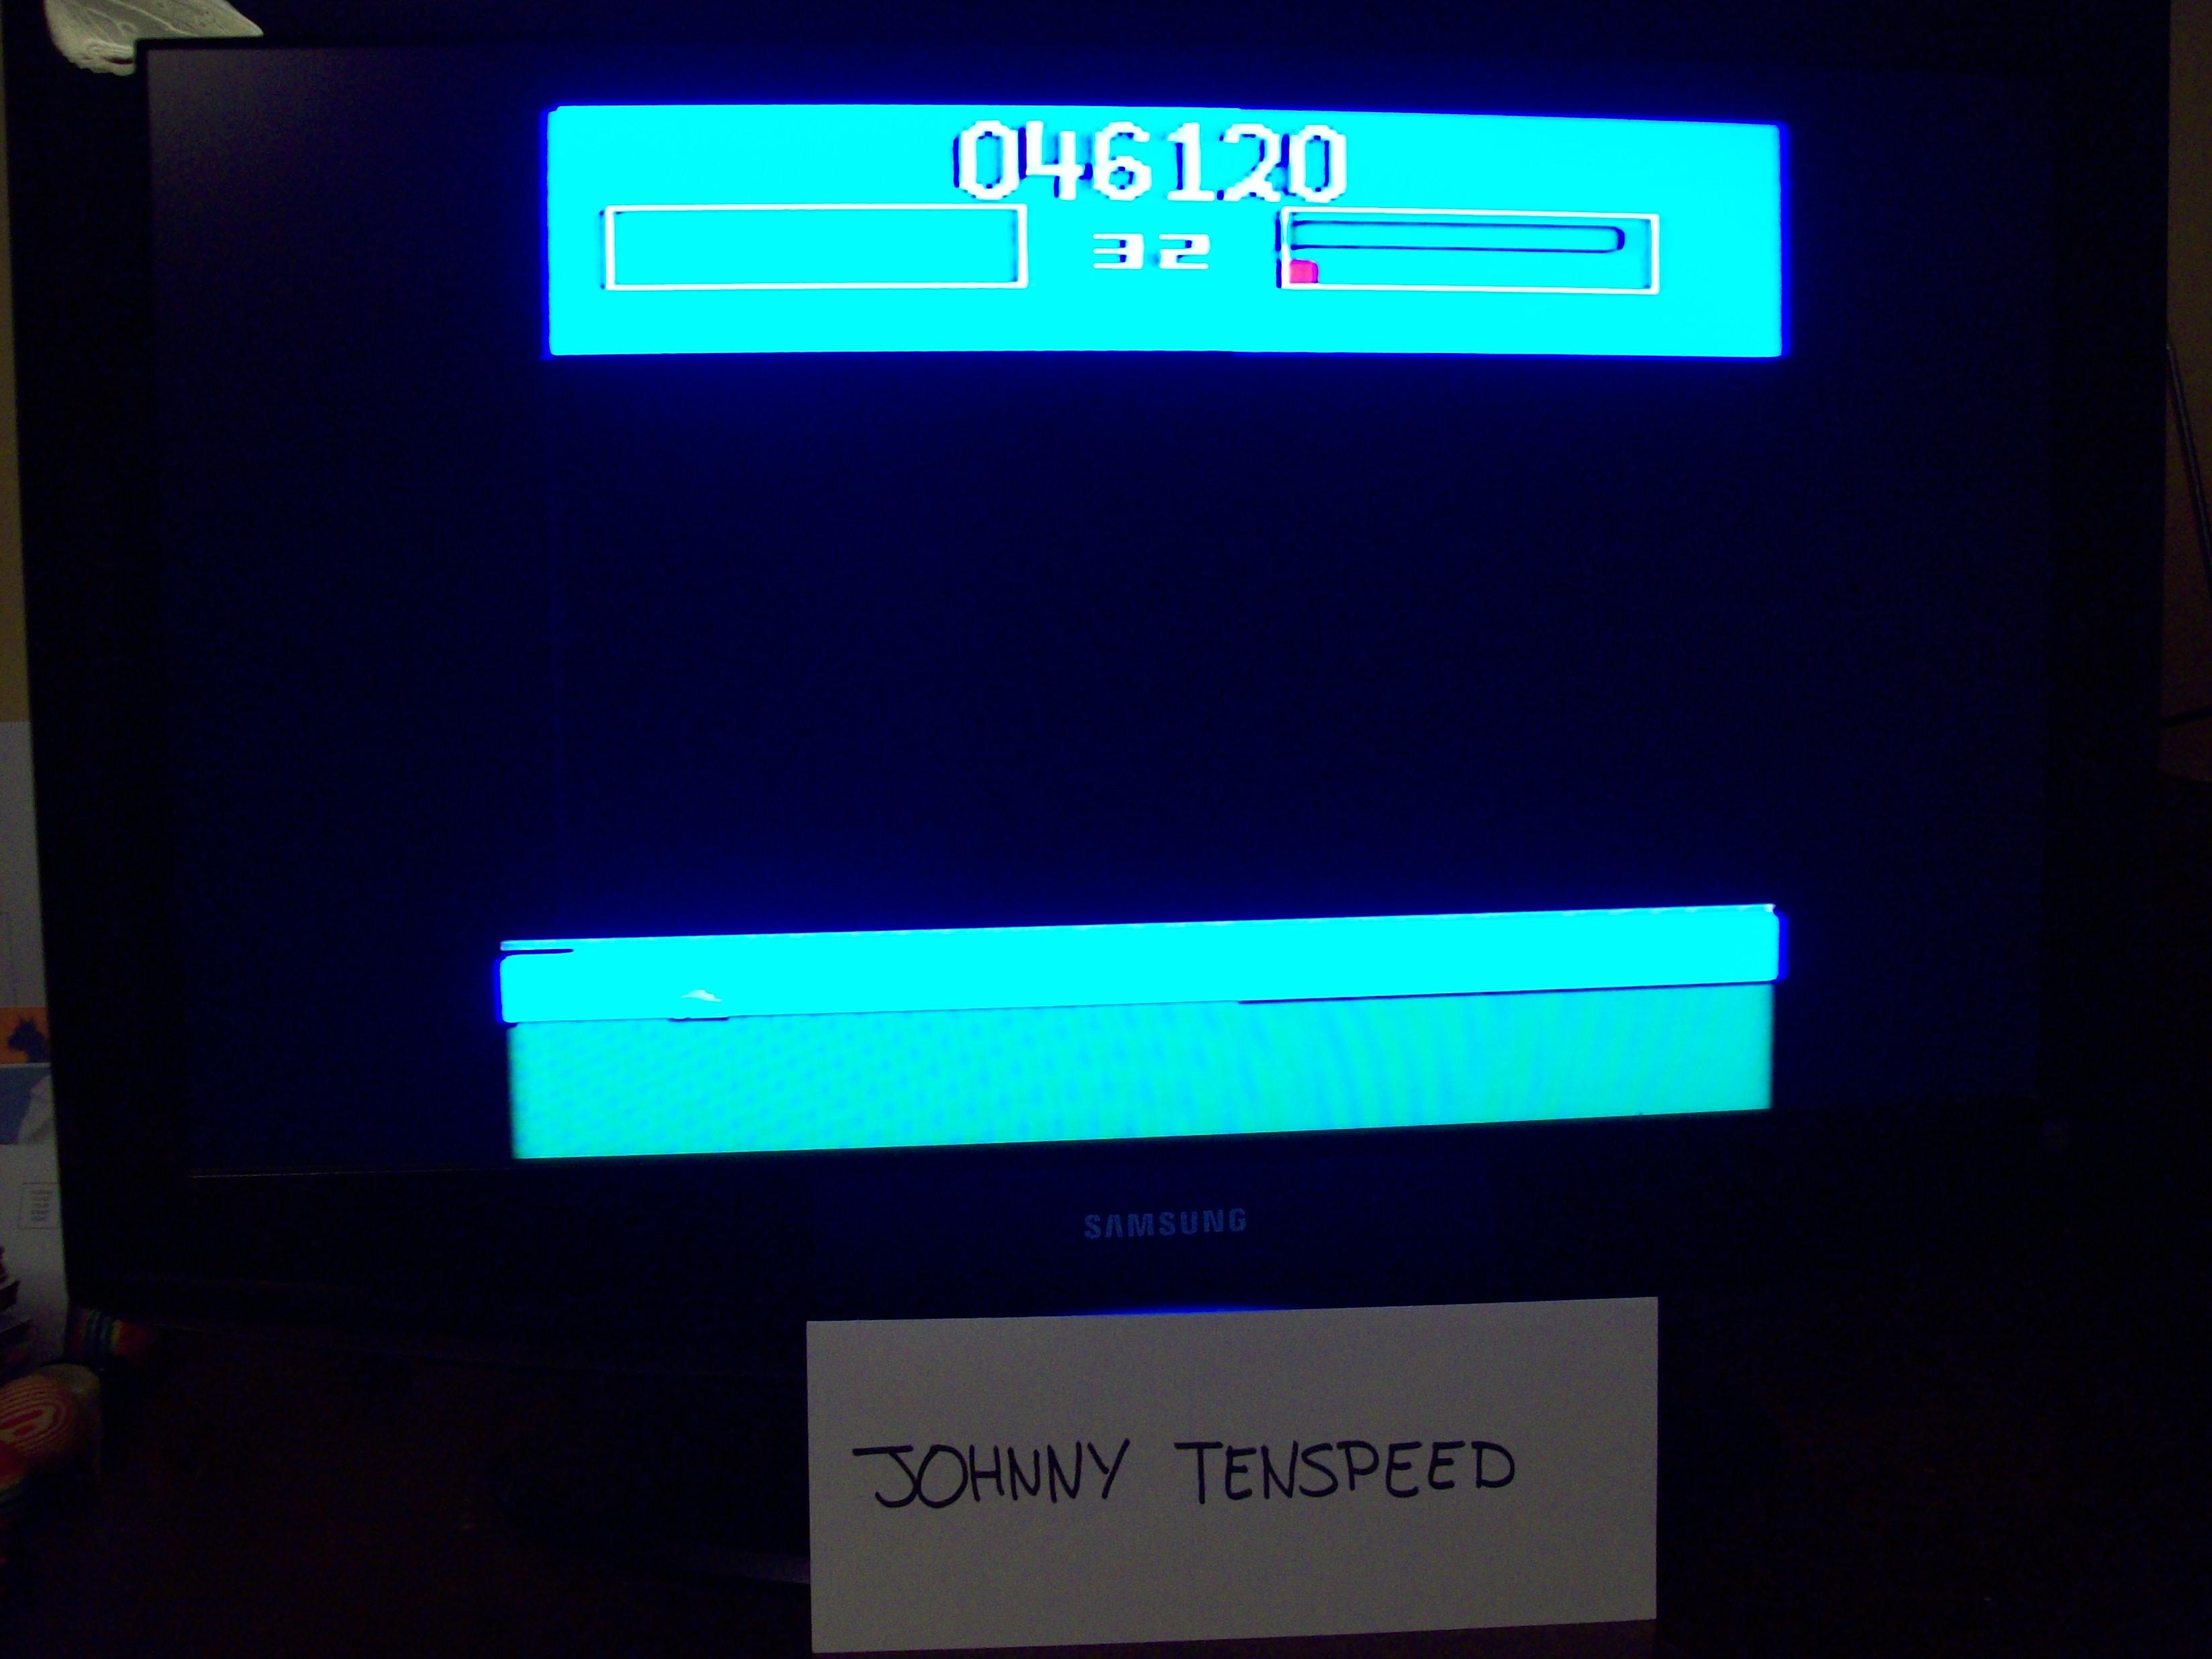 JohnnyTenspeed: Killer Satellites (Atari 2600 Novice/B) 46,120 points on 2015-03-08 22:05:36